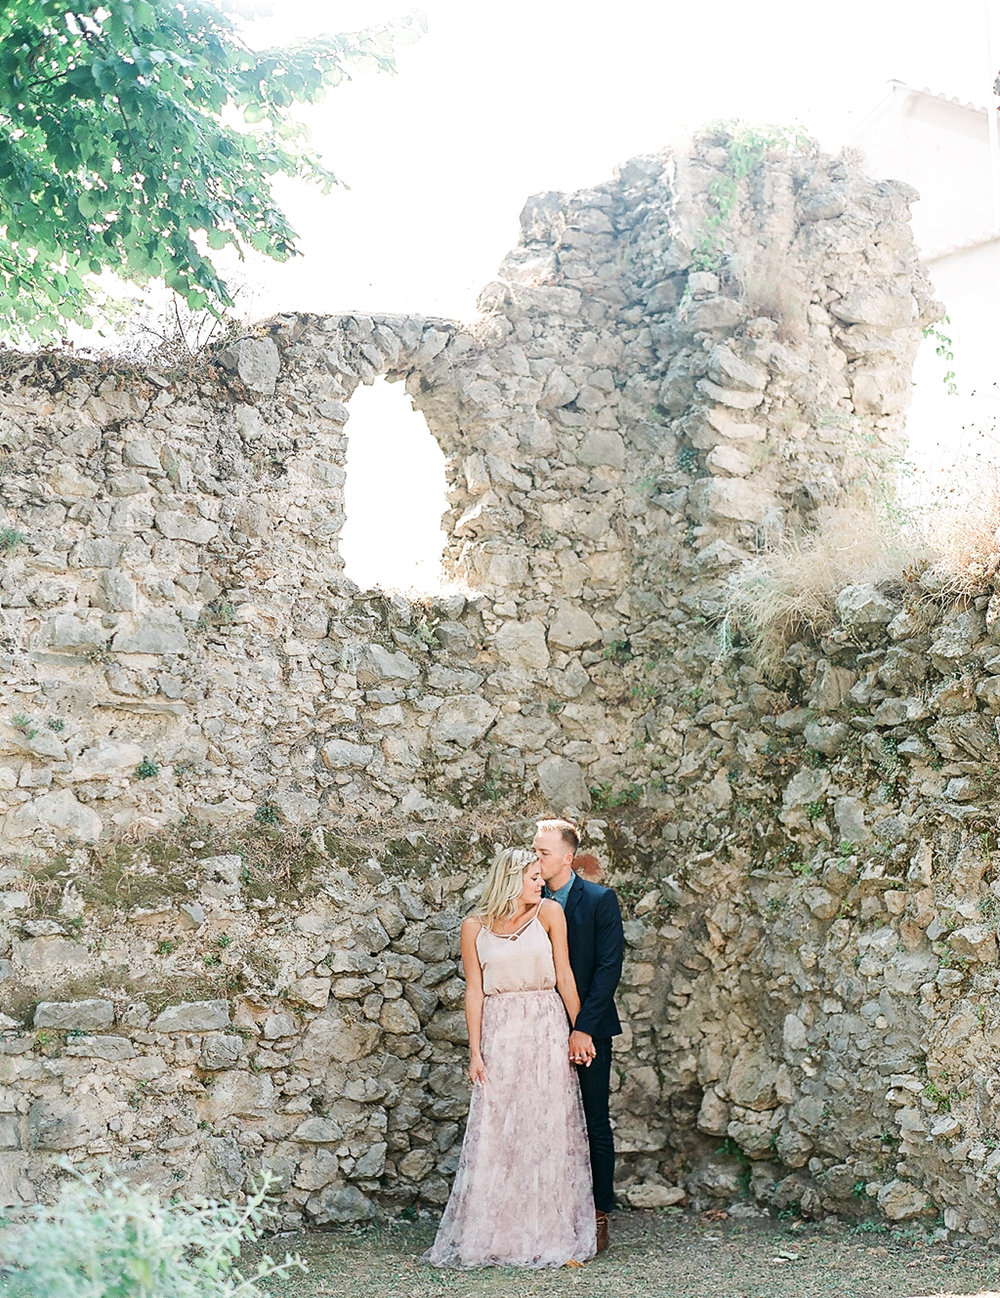 Bonphotage Amalfi Coast Italy Fine Art Wedding Photography